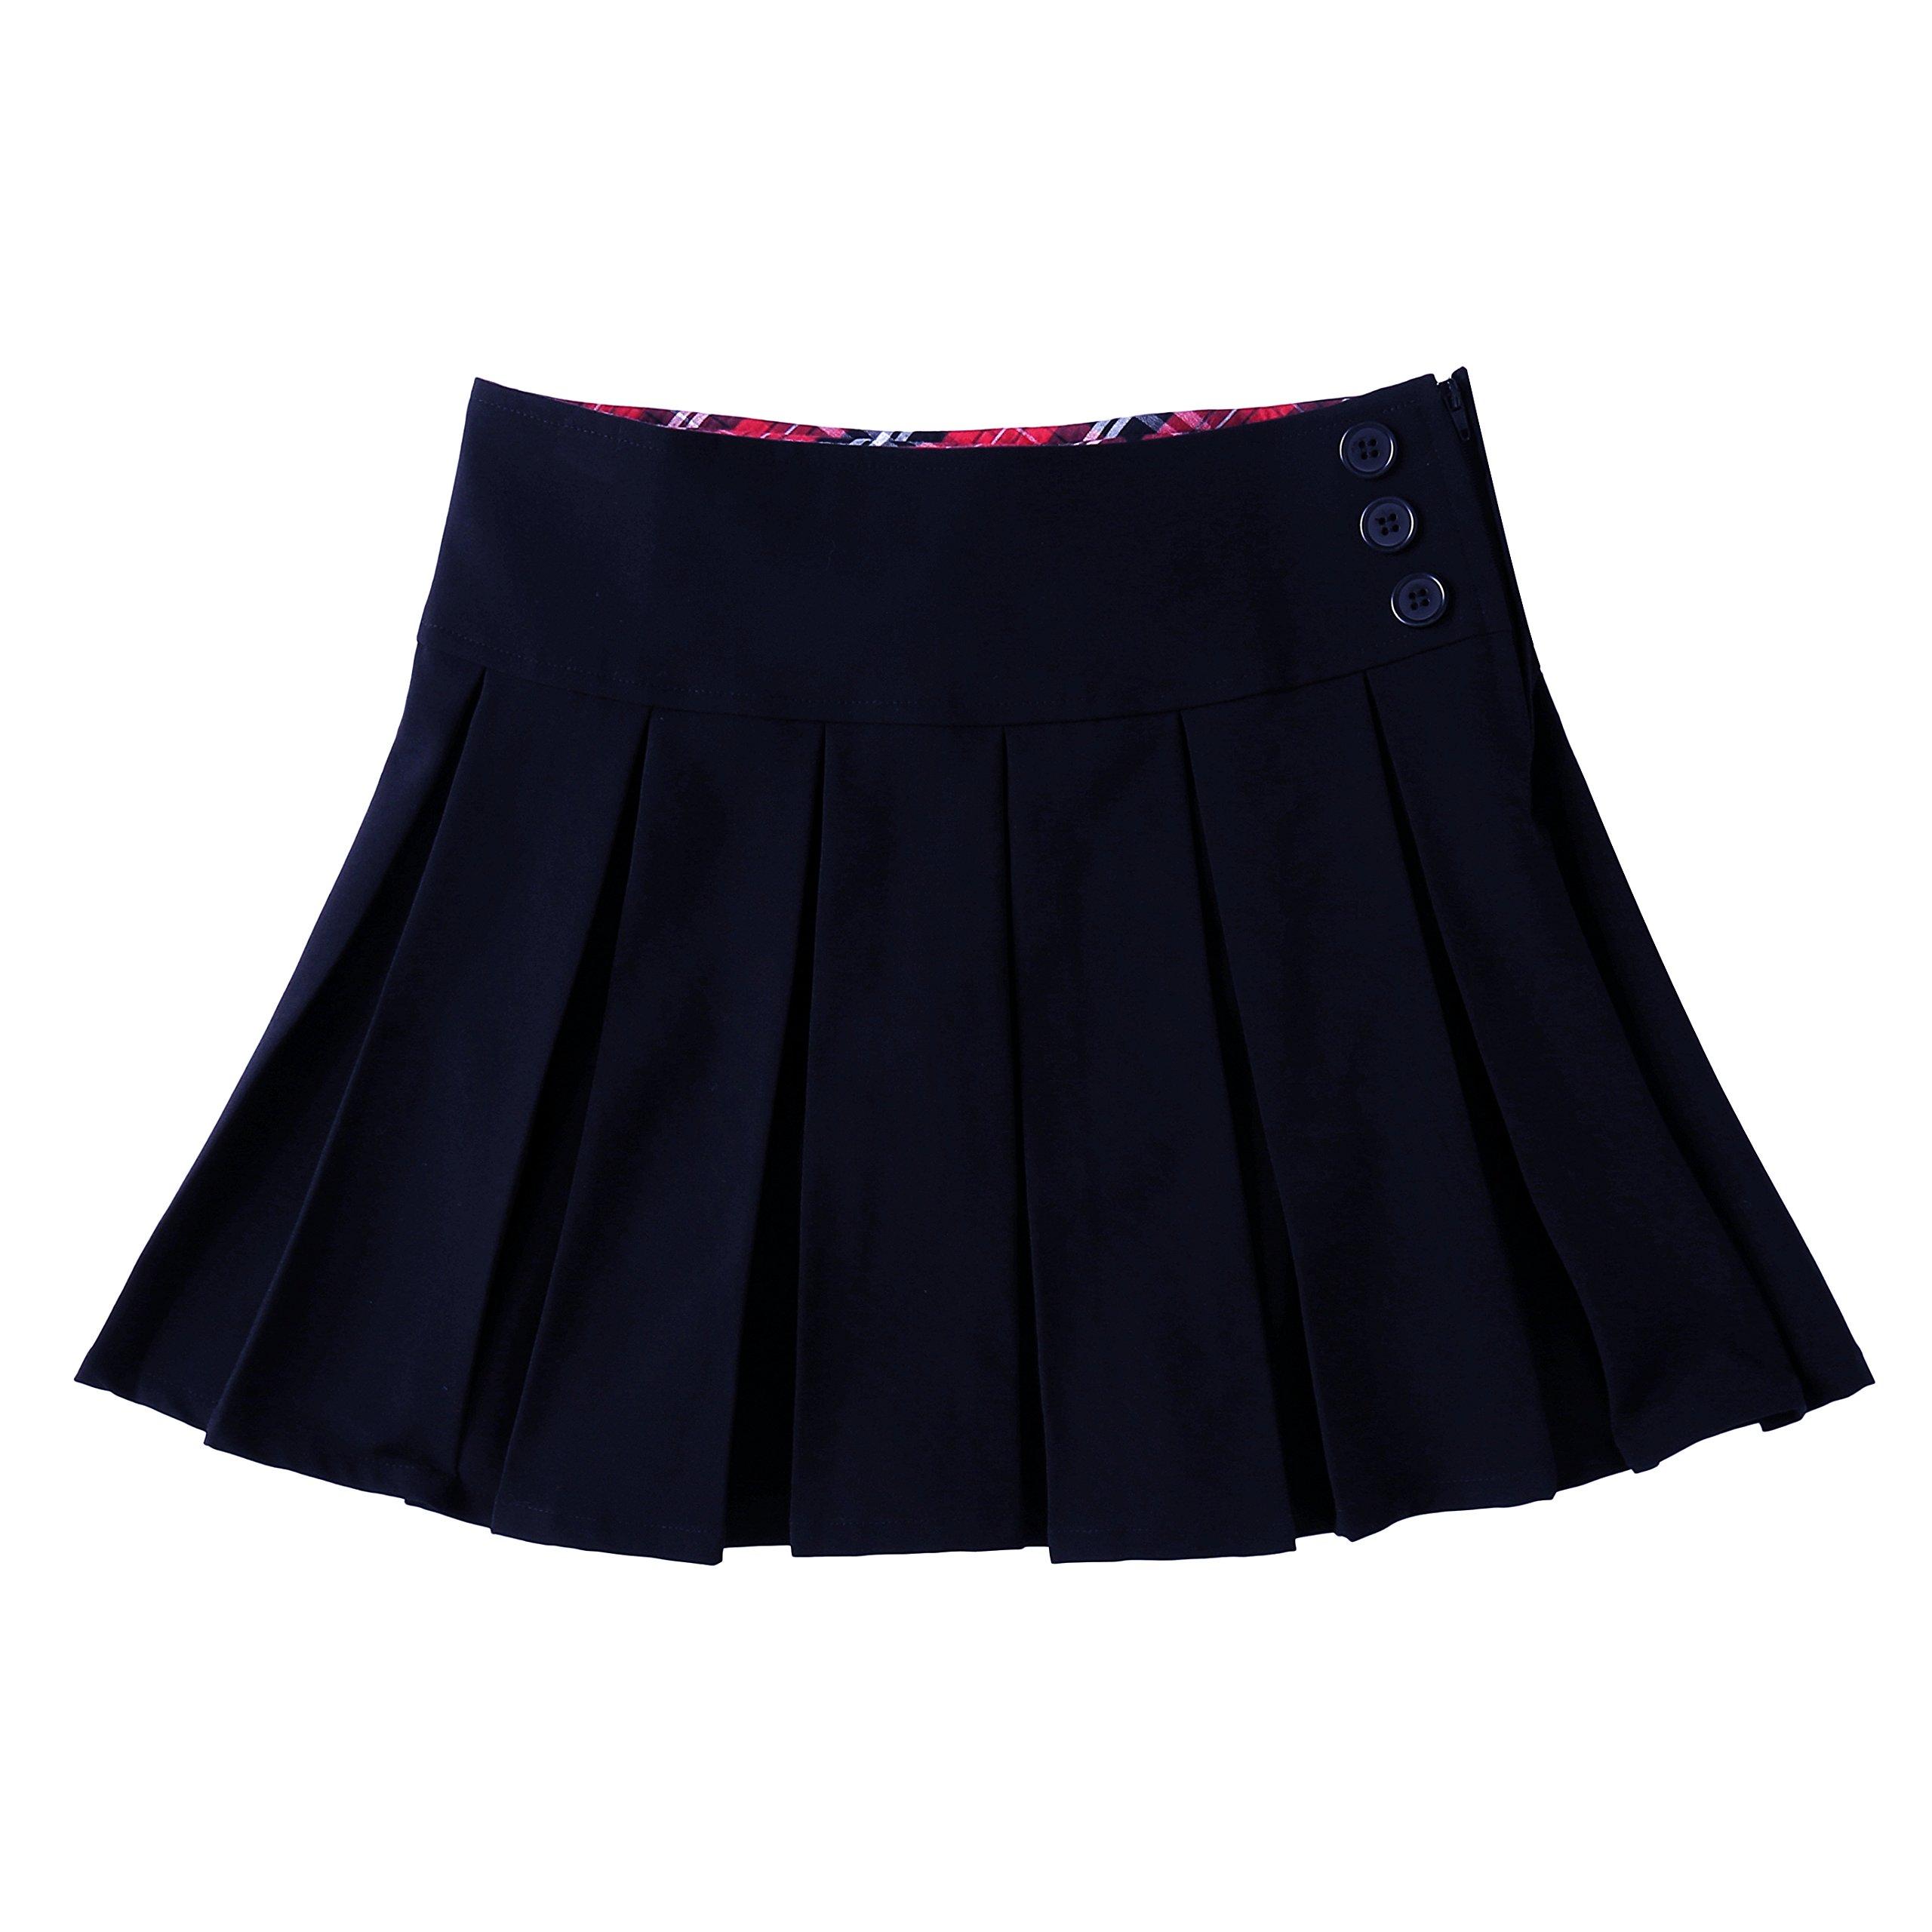 Bienzoe Girl's Pleated Hem School Uniform Skirt Navy 8